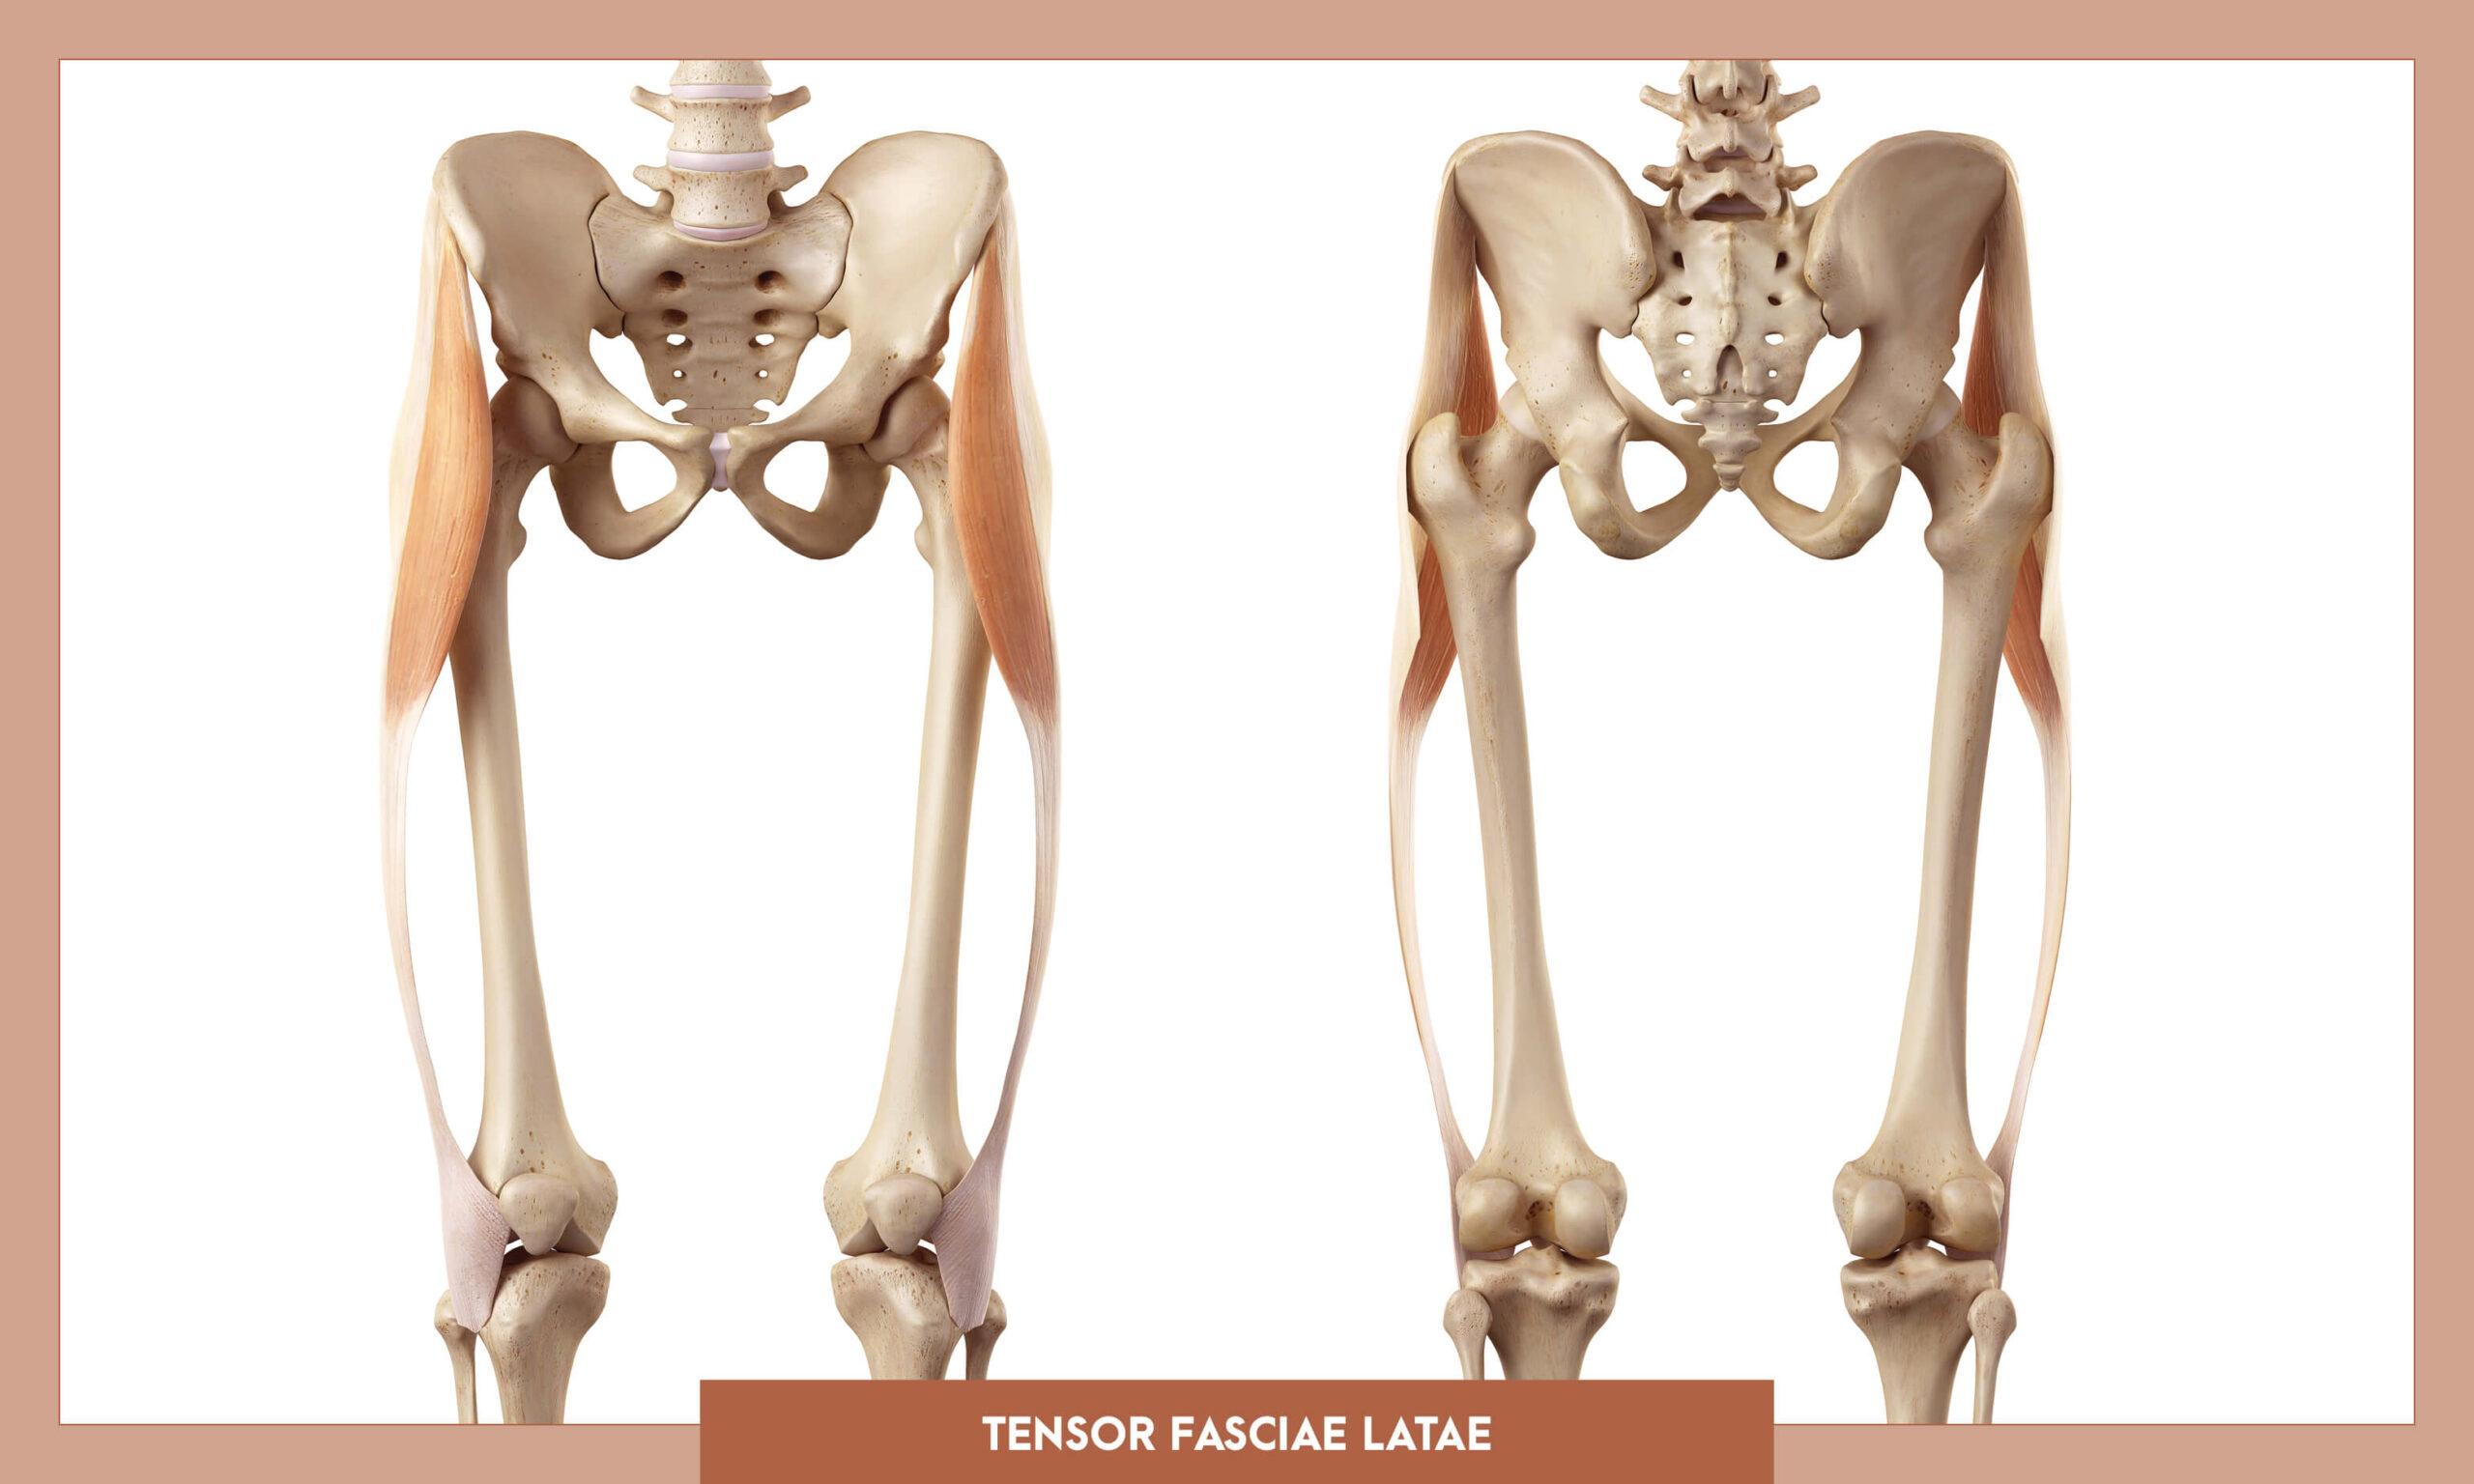 Muscles of the Lower Limb - Tensor fascia latae